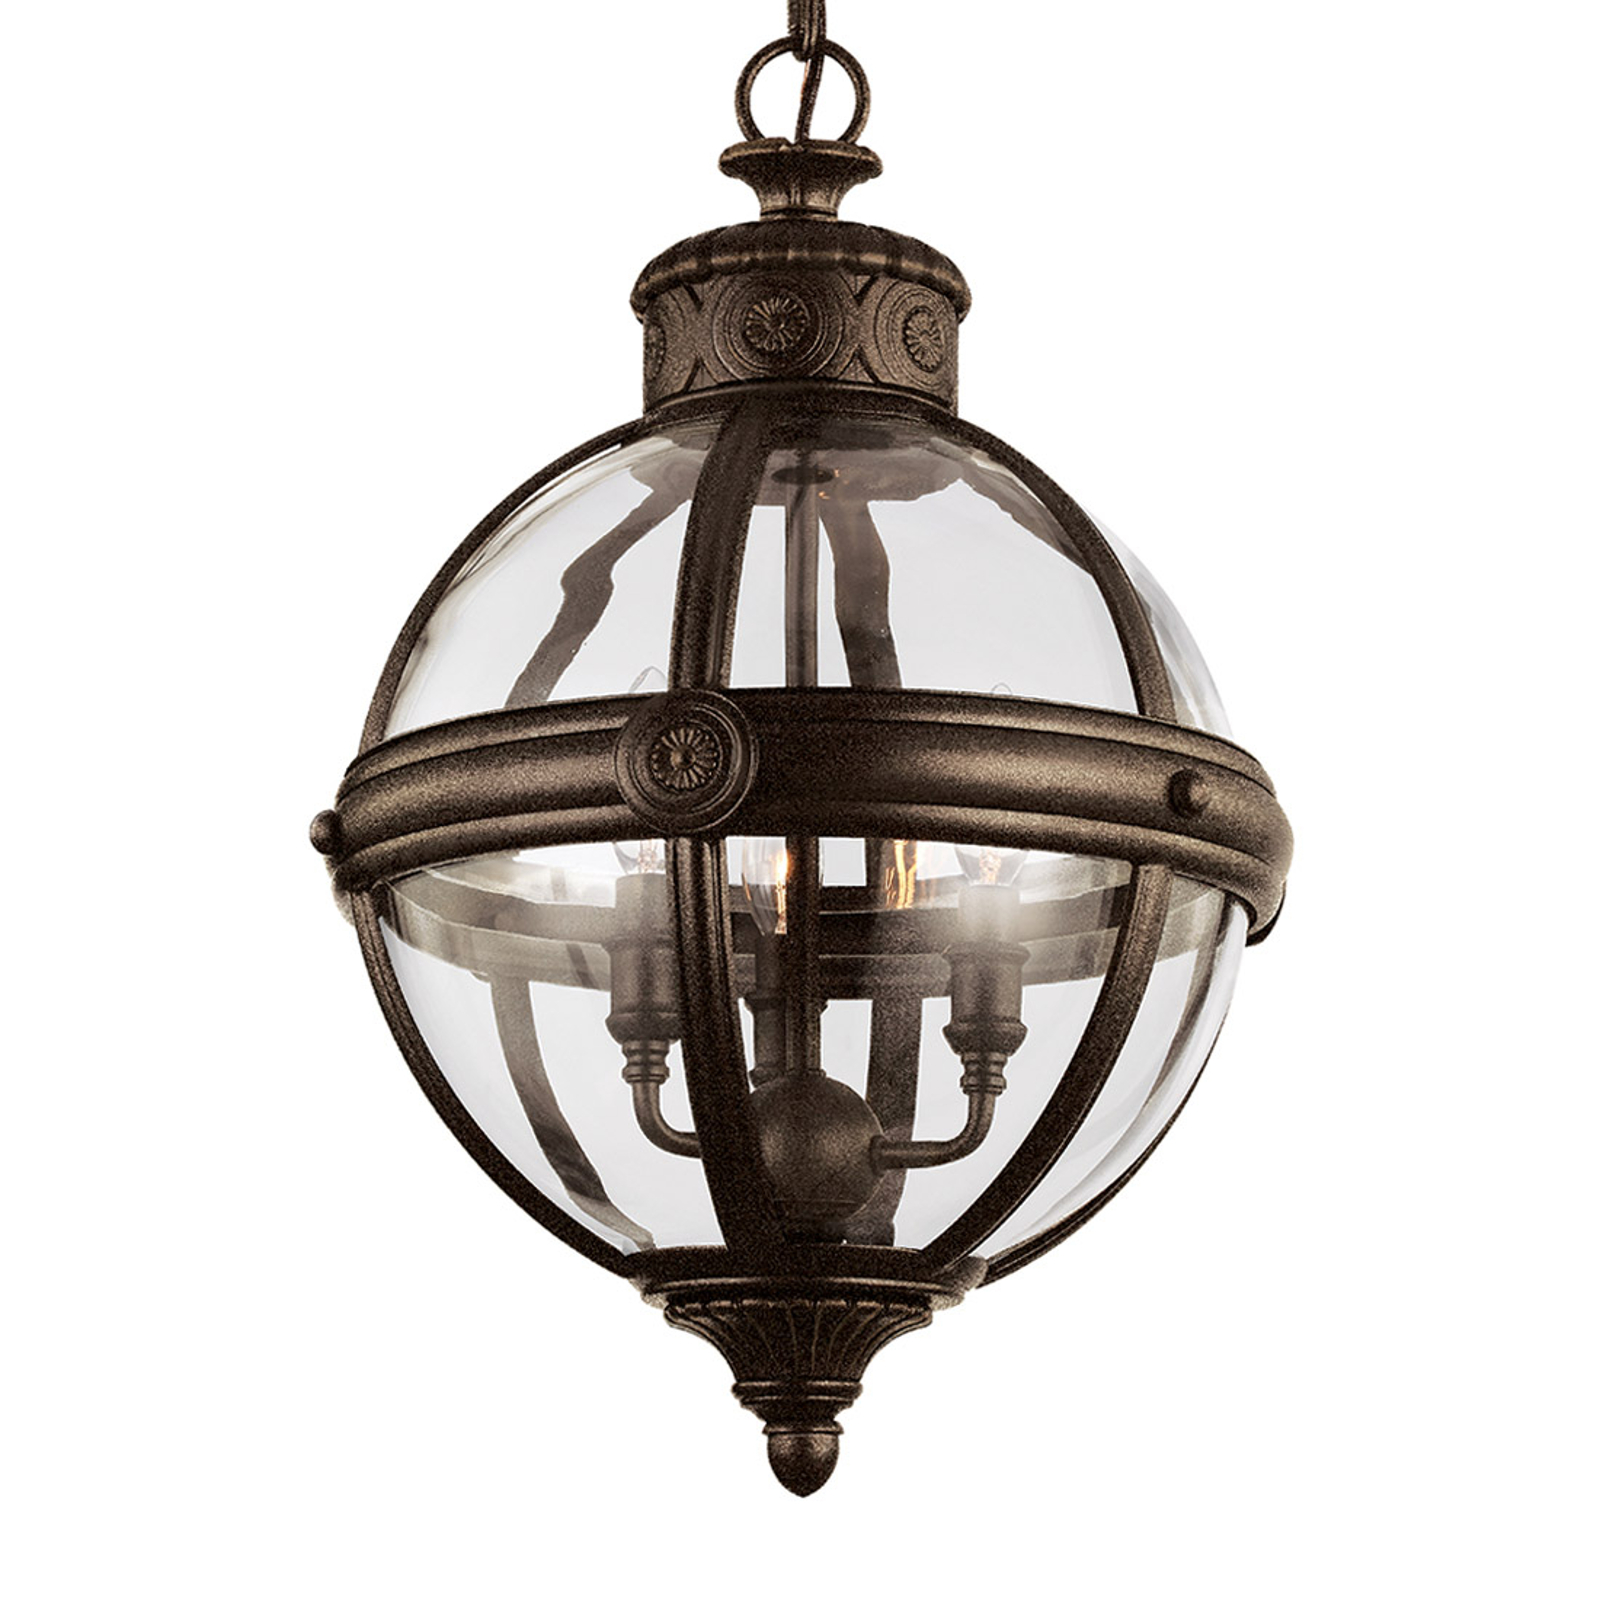 Adams hængelampe, Ø 37 cm, bronze